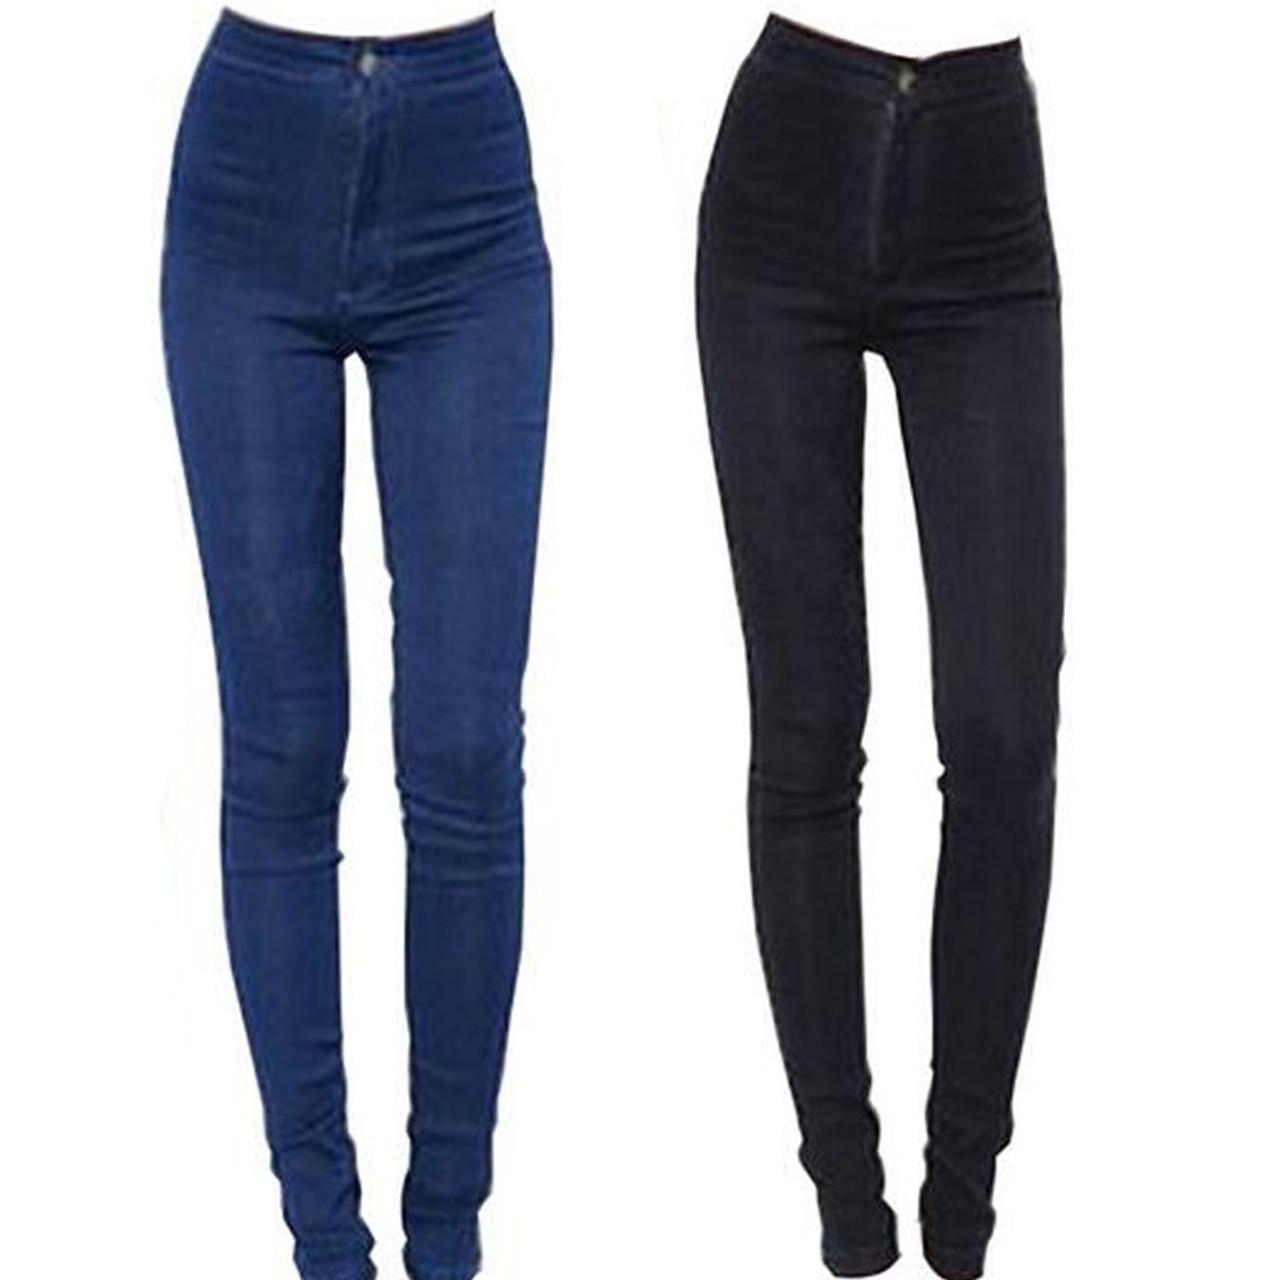 a7028c4f3b3 ... 2018 New Fashion Jeans Women Pencil Pants High Waist Jeans Sexy Slim  Elastic Skinny Pants Trousers ...